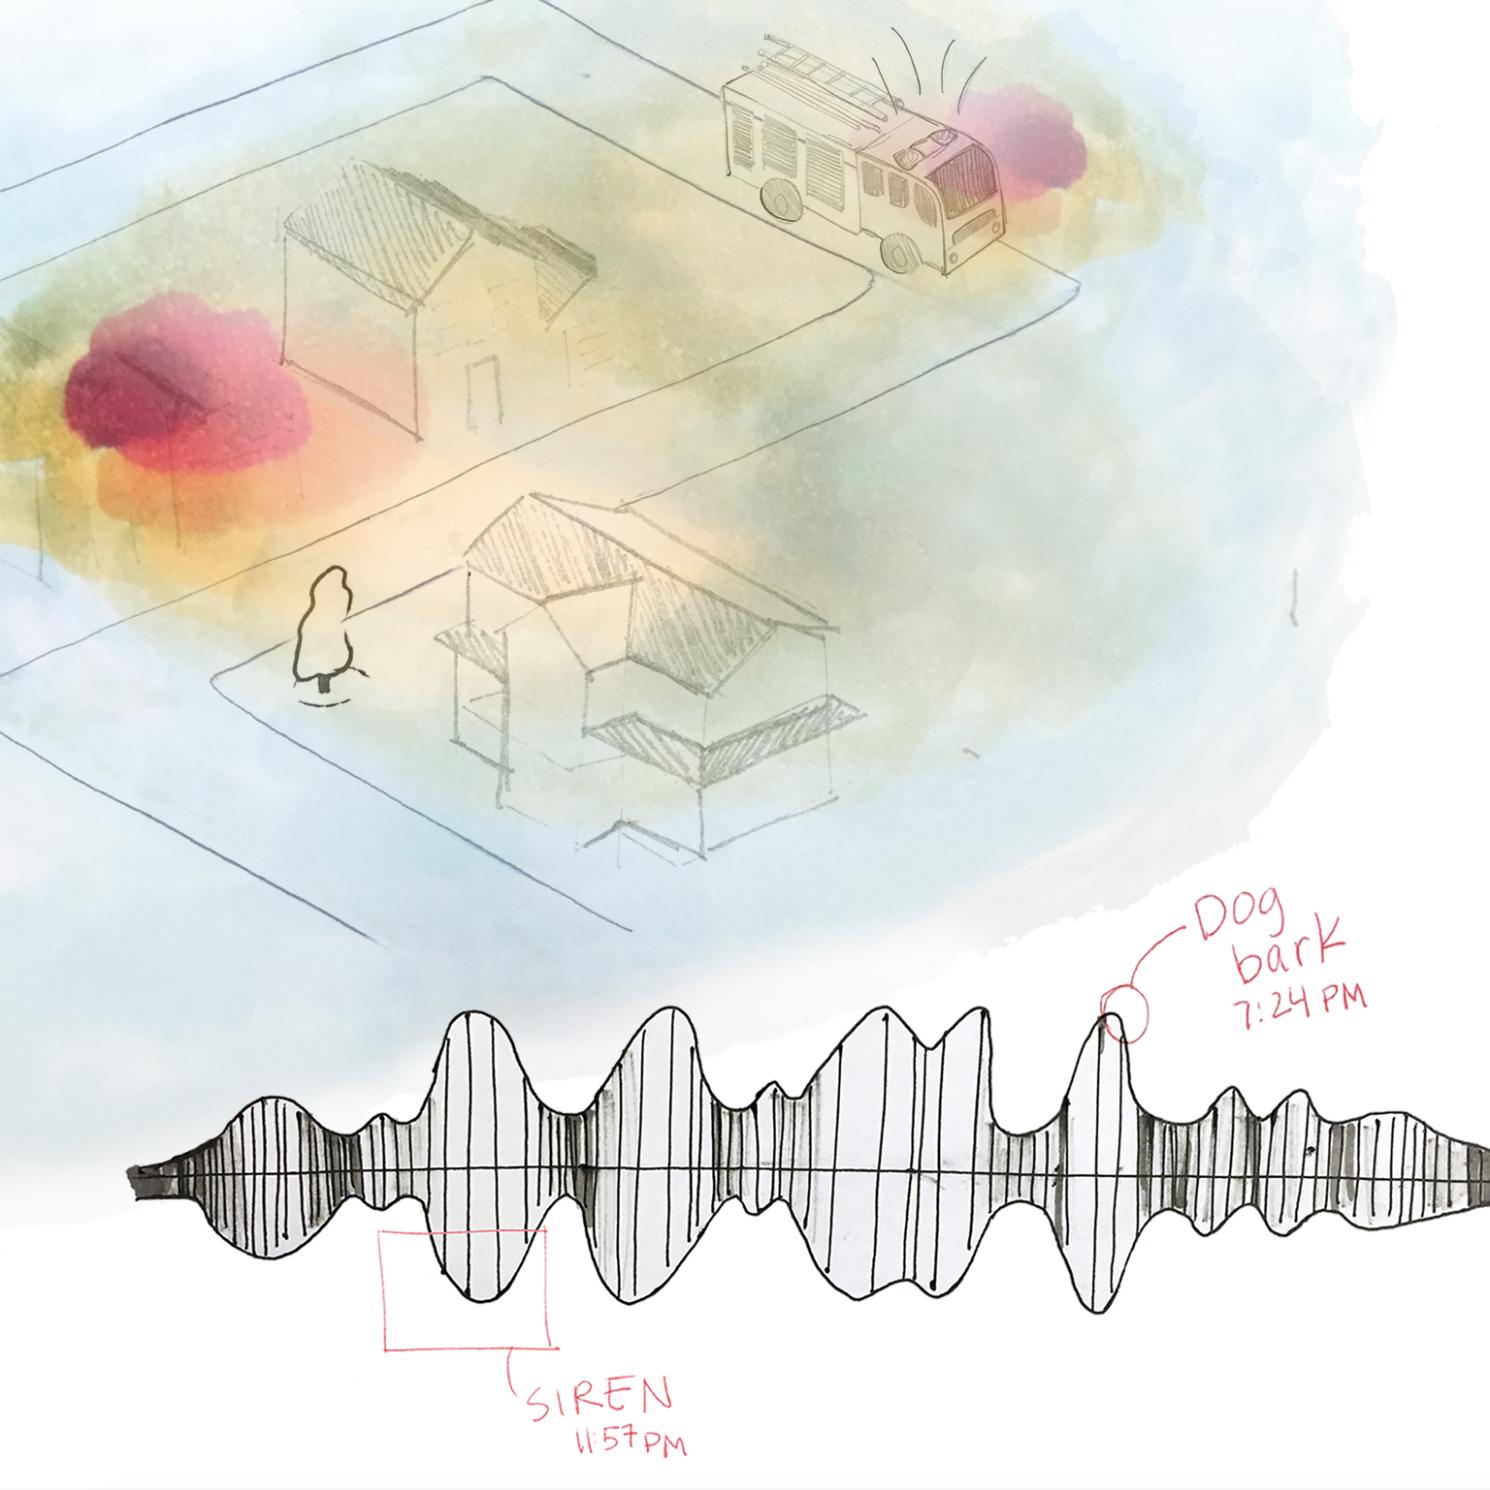 STFU - The sound visualization concept